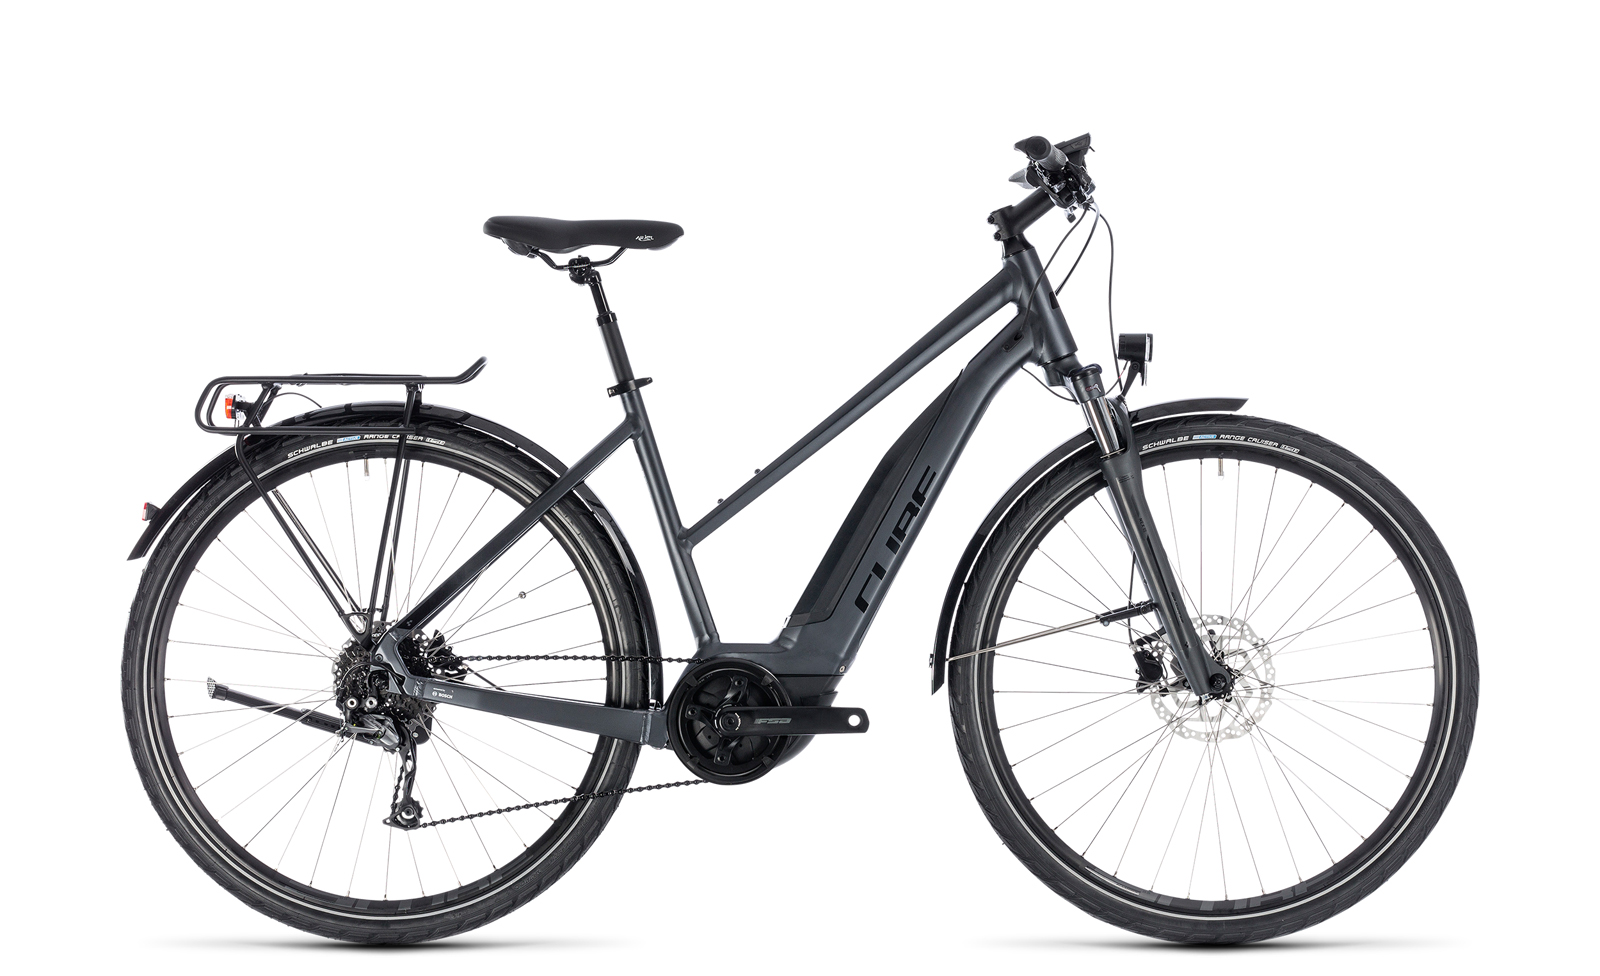 cube touring hybrid one 500 damen trekking pedelec e bike fahrrad grau schwarz 2018 von top. Black Bedroom Furniture Sets. Home Design Ideas